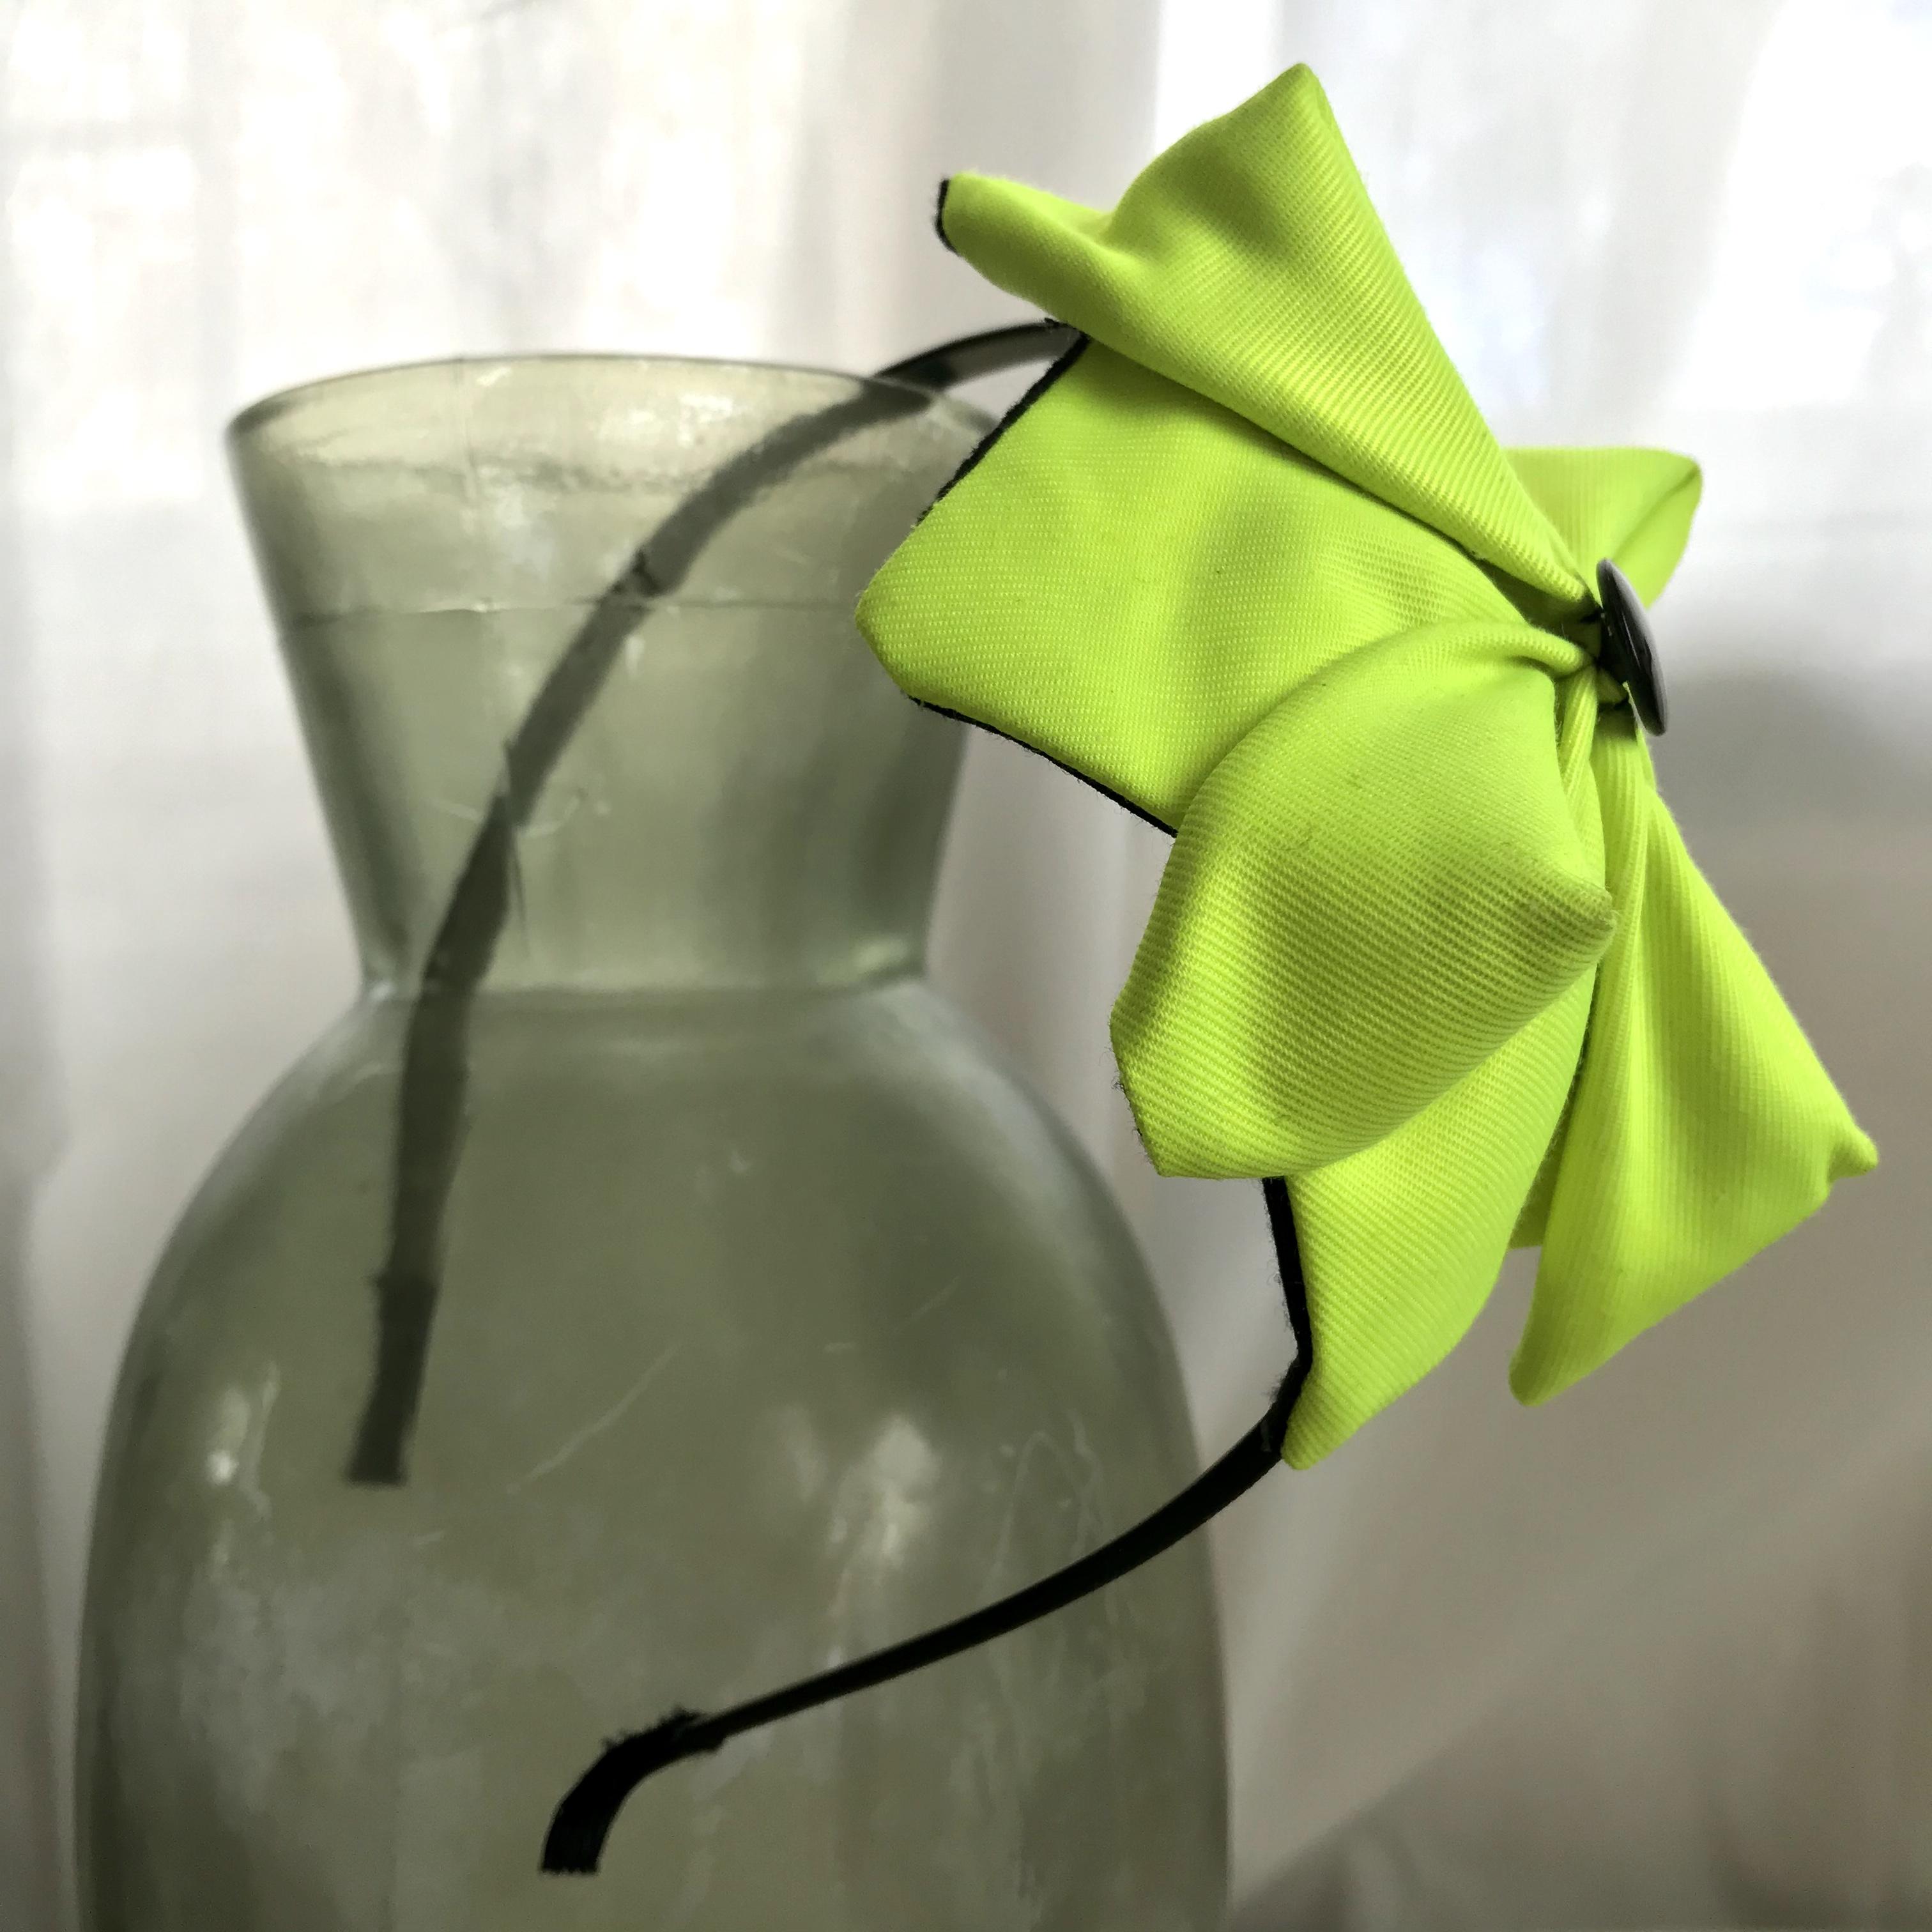 Tyra Therman: Origami-panta, neonkeltainen, ALE